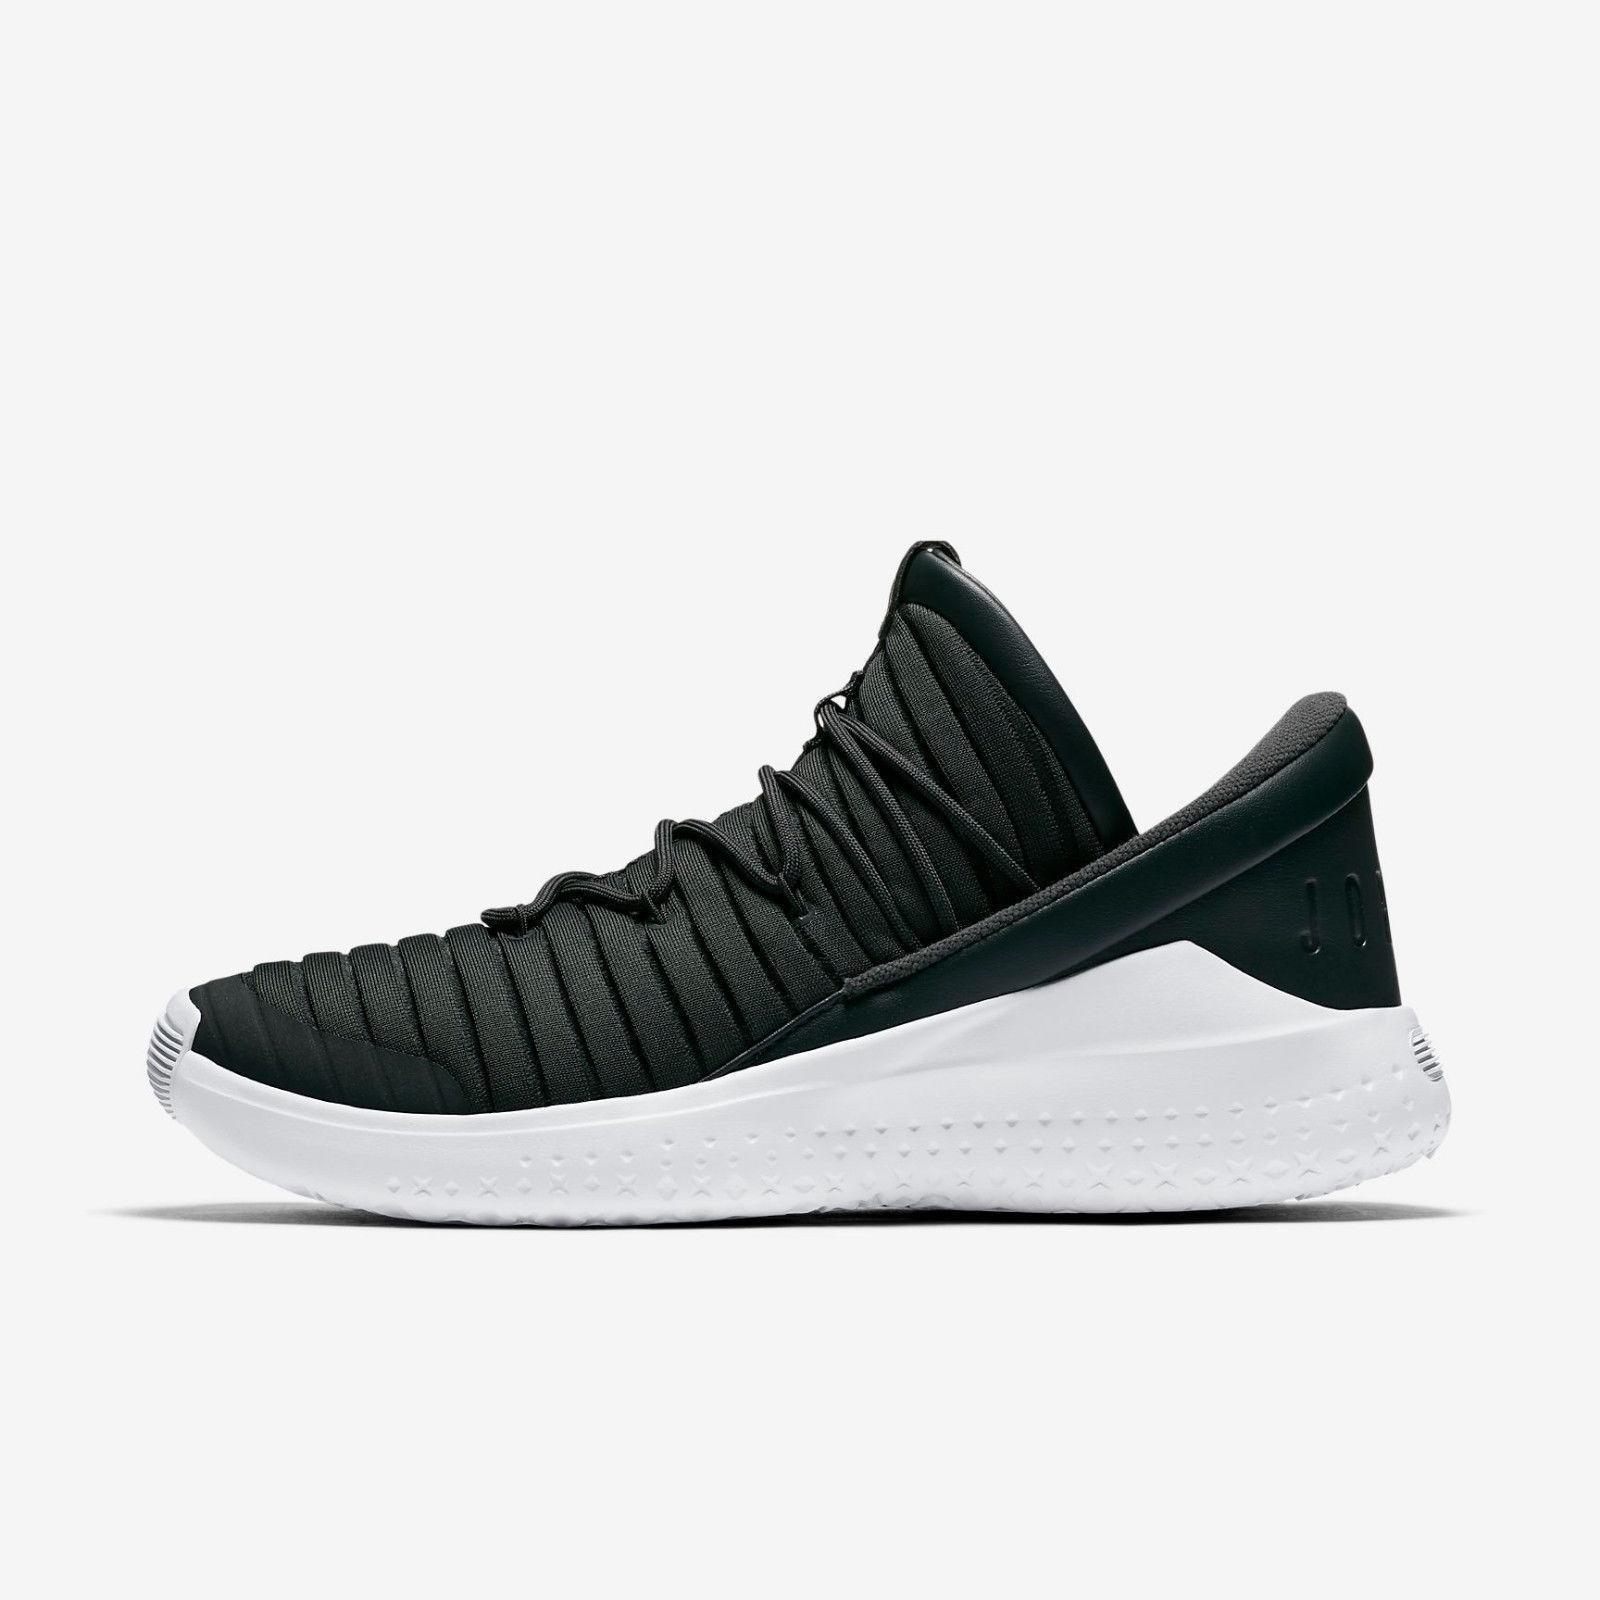 meet 750ea e9ad0 Nike Men s Jordan Flight Luxe Basketball Sneakers Size 7 to 13 us 919715 005